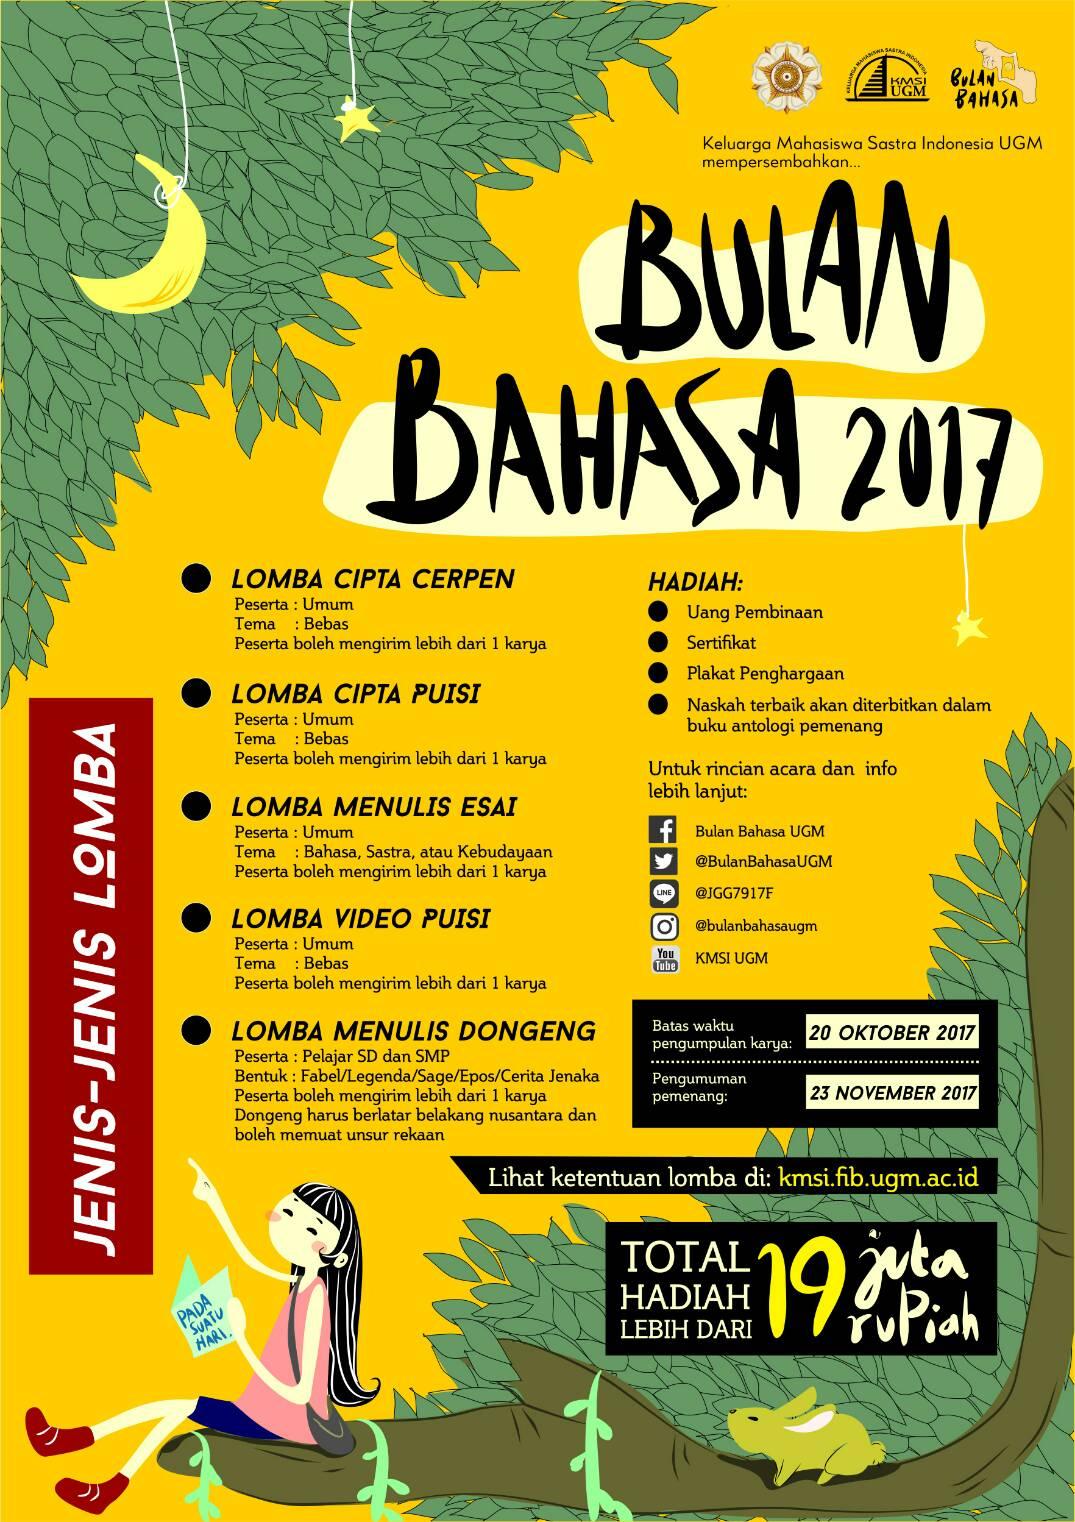 Lomba Cipta Cerpen Bulan Bahasa 2017 | Univ. Gadjah Mada | Umum